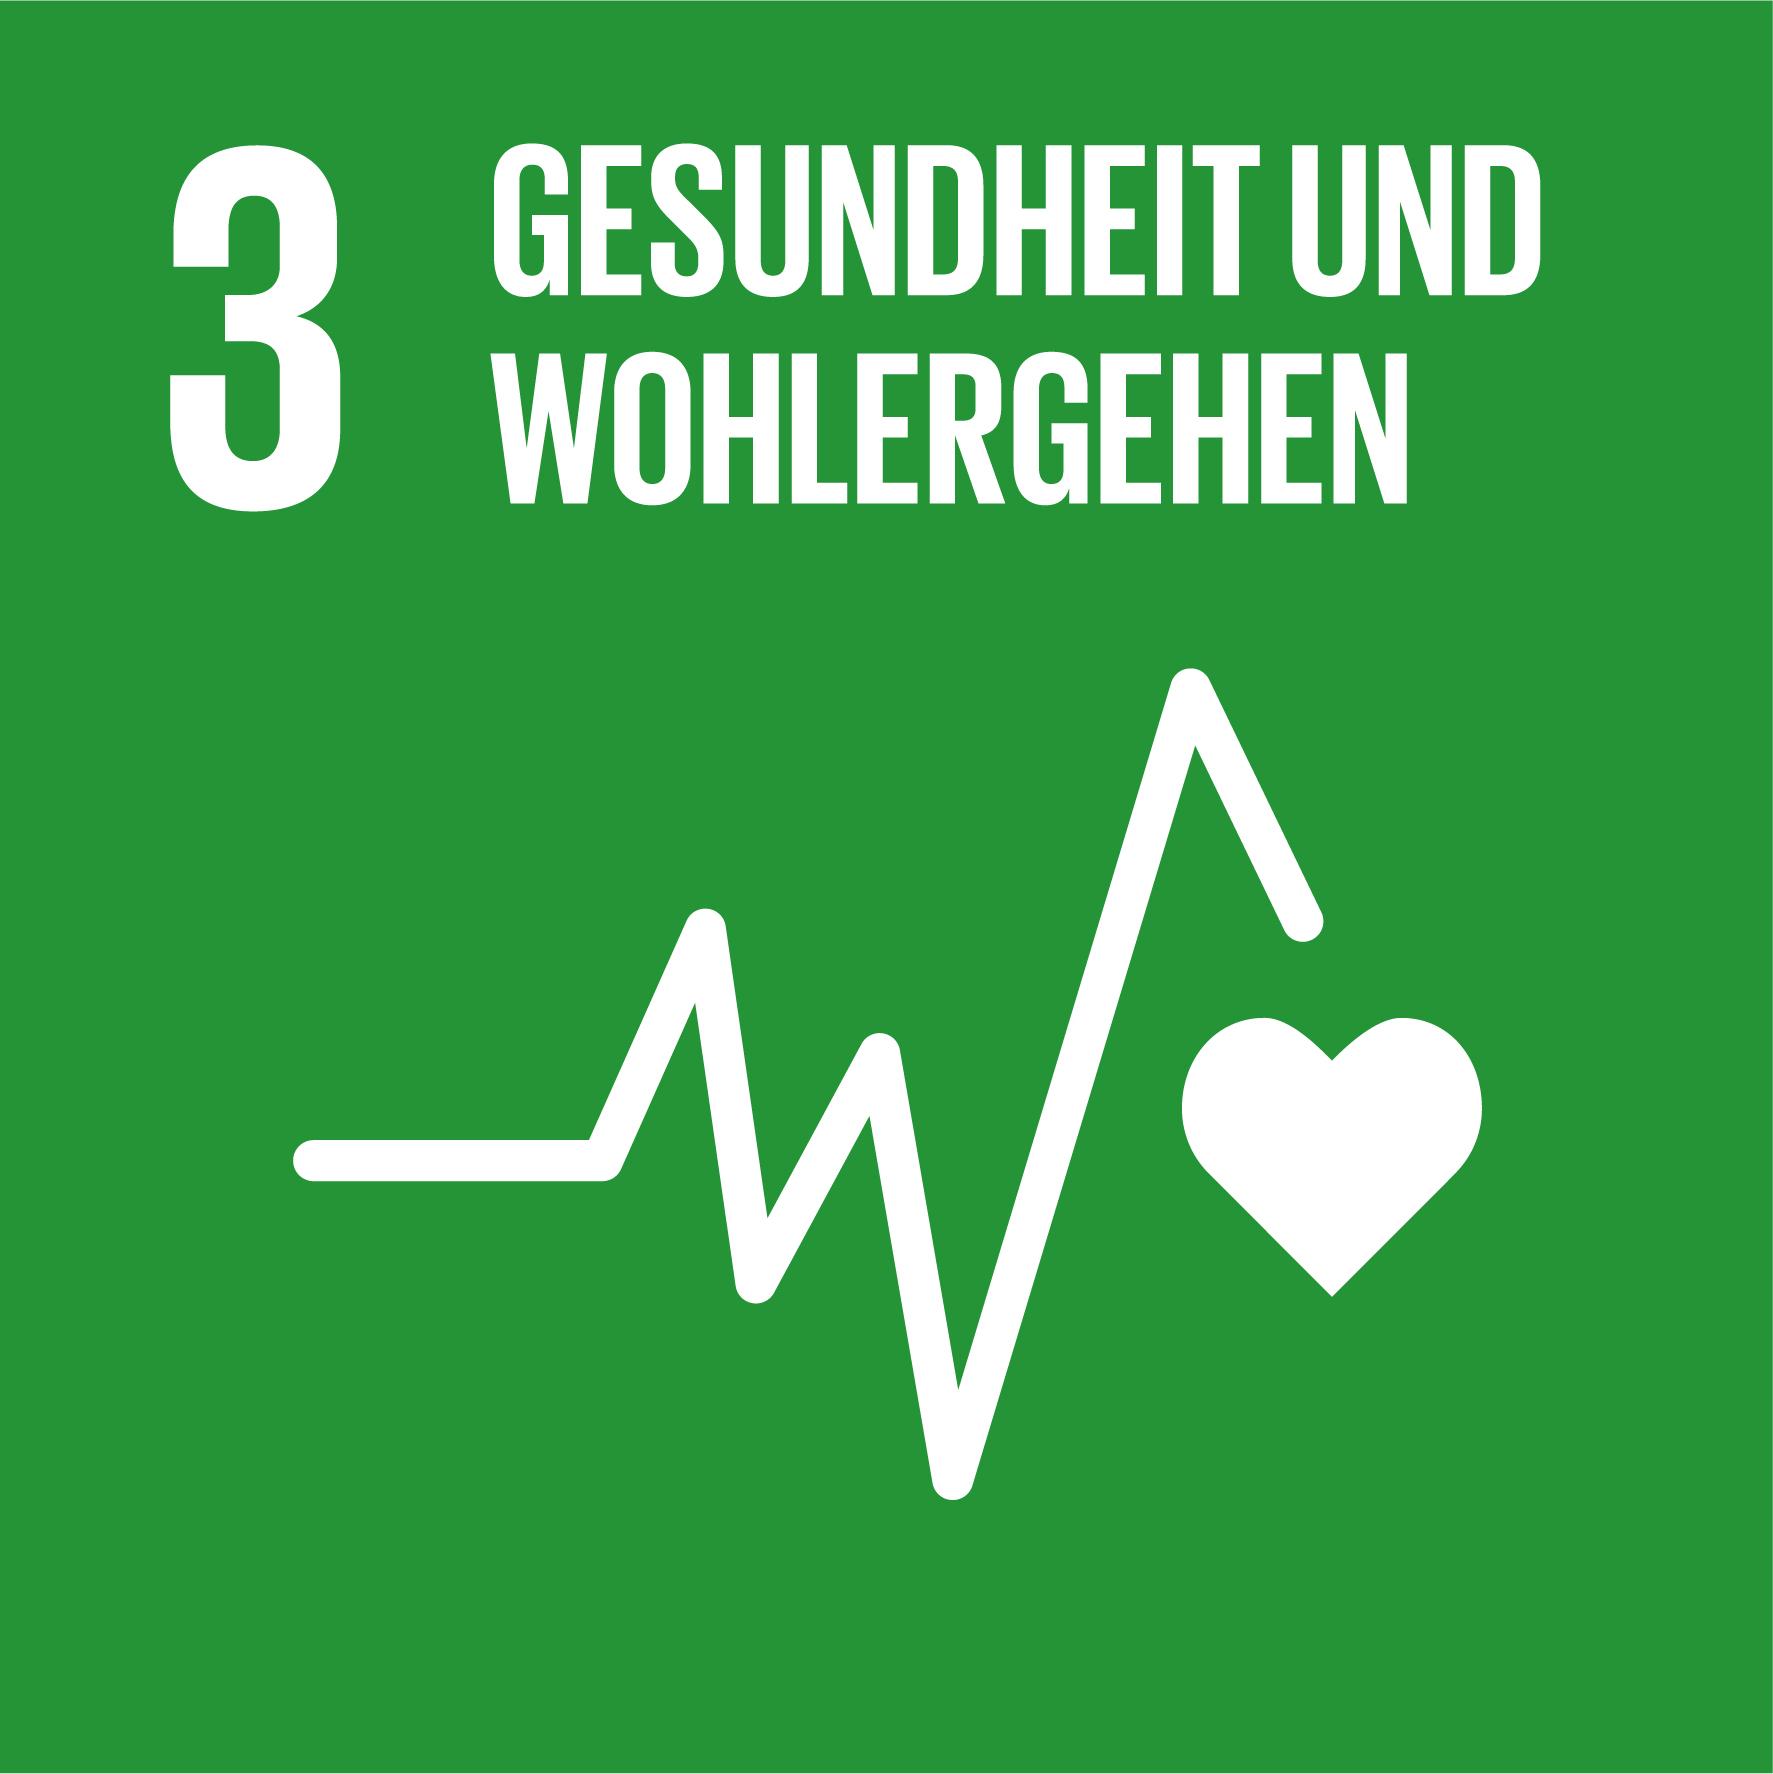 Regensburger Nachhaltigkeitswoche - SDG 3